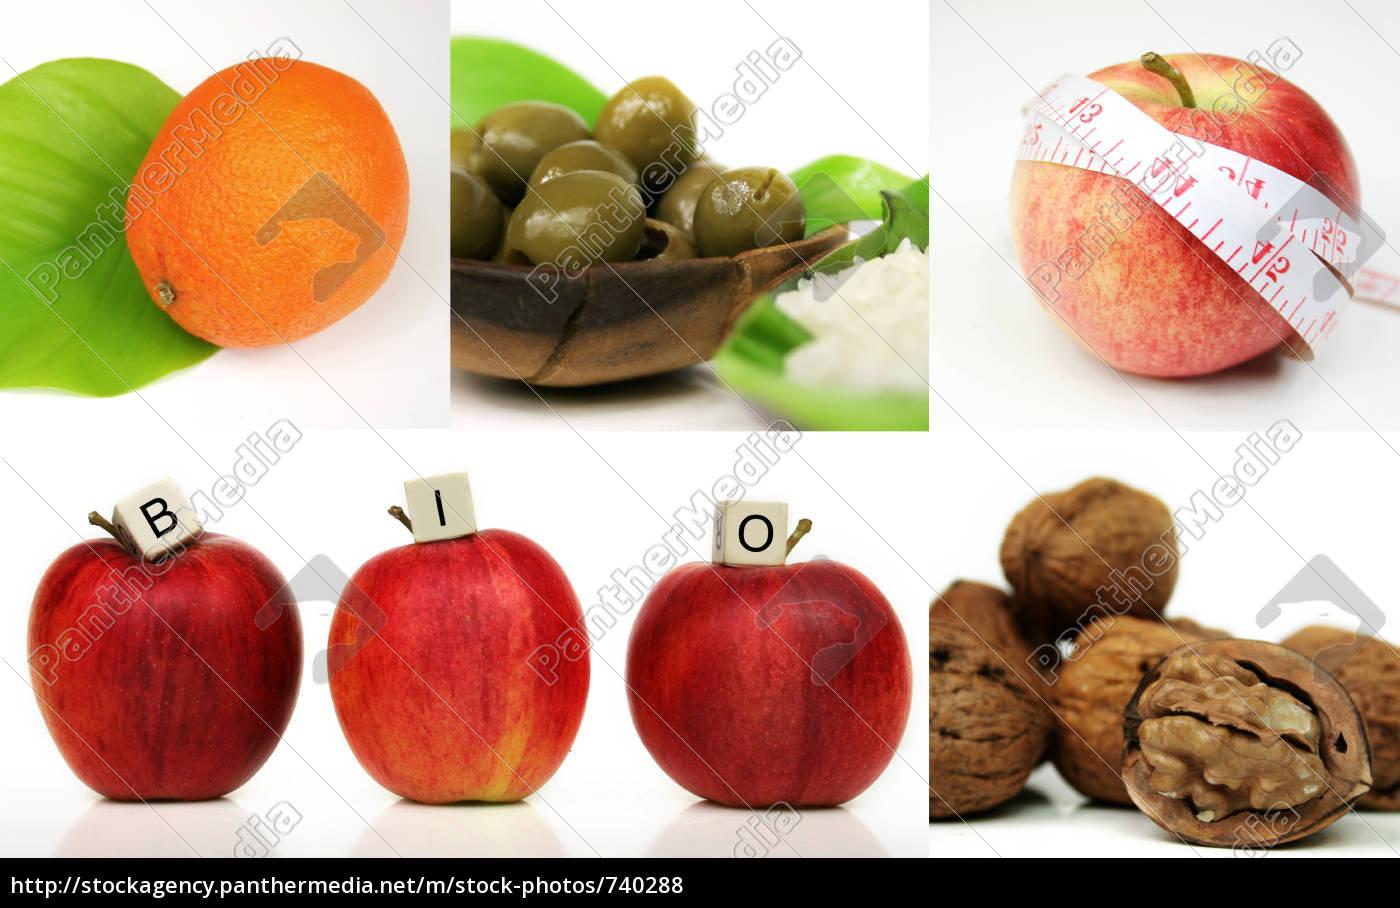 healthy, eating - 740288